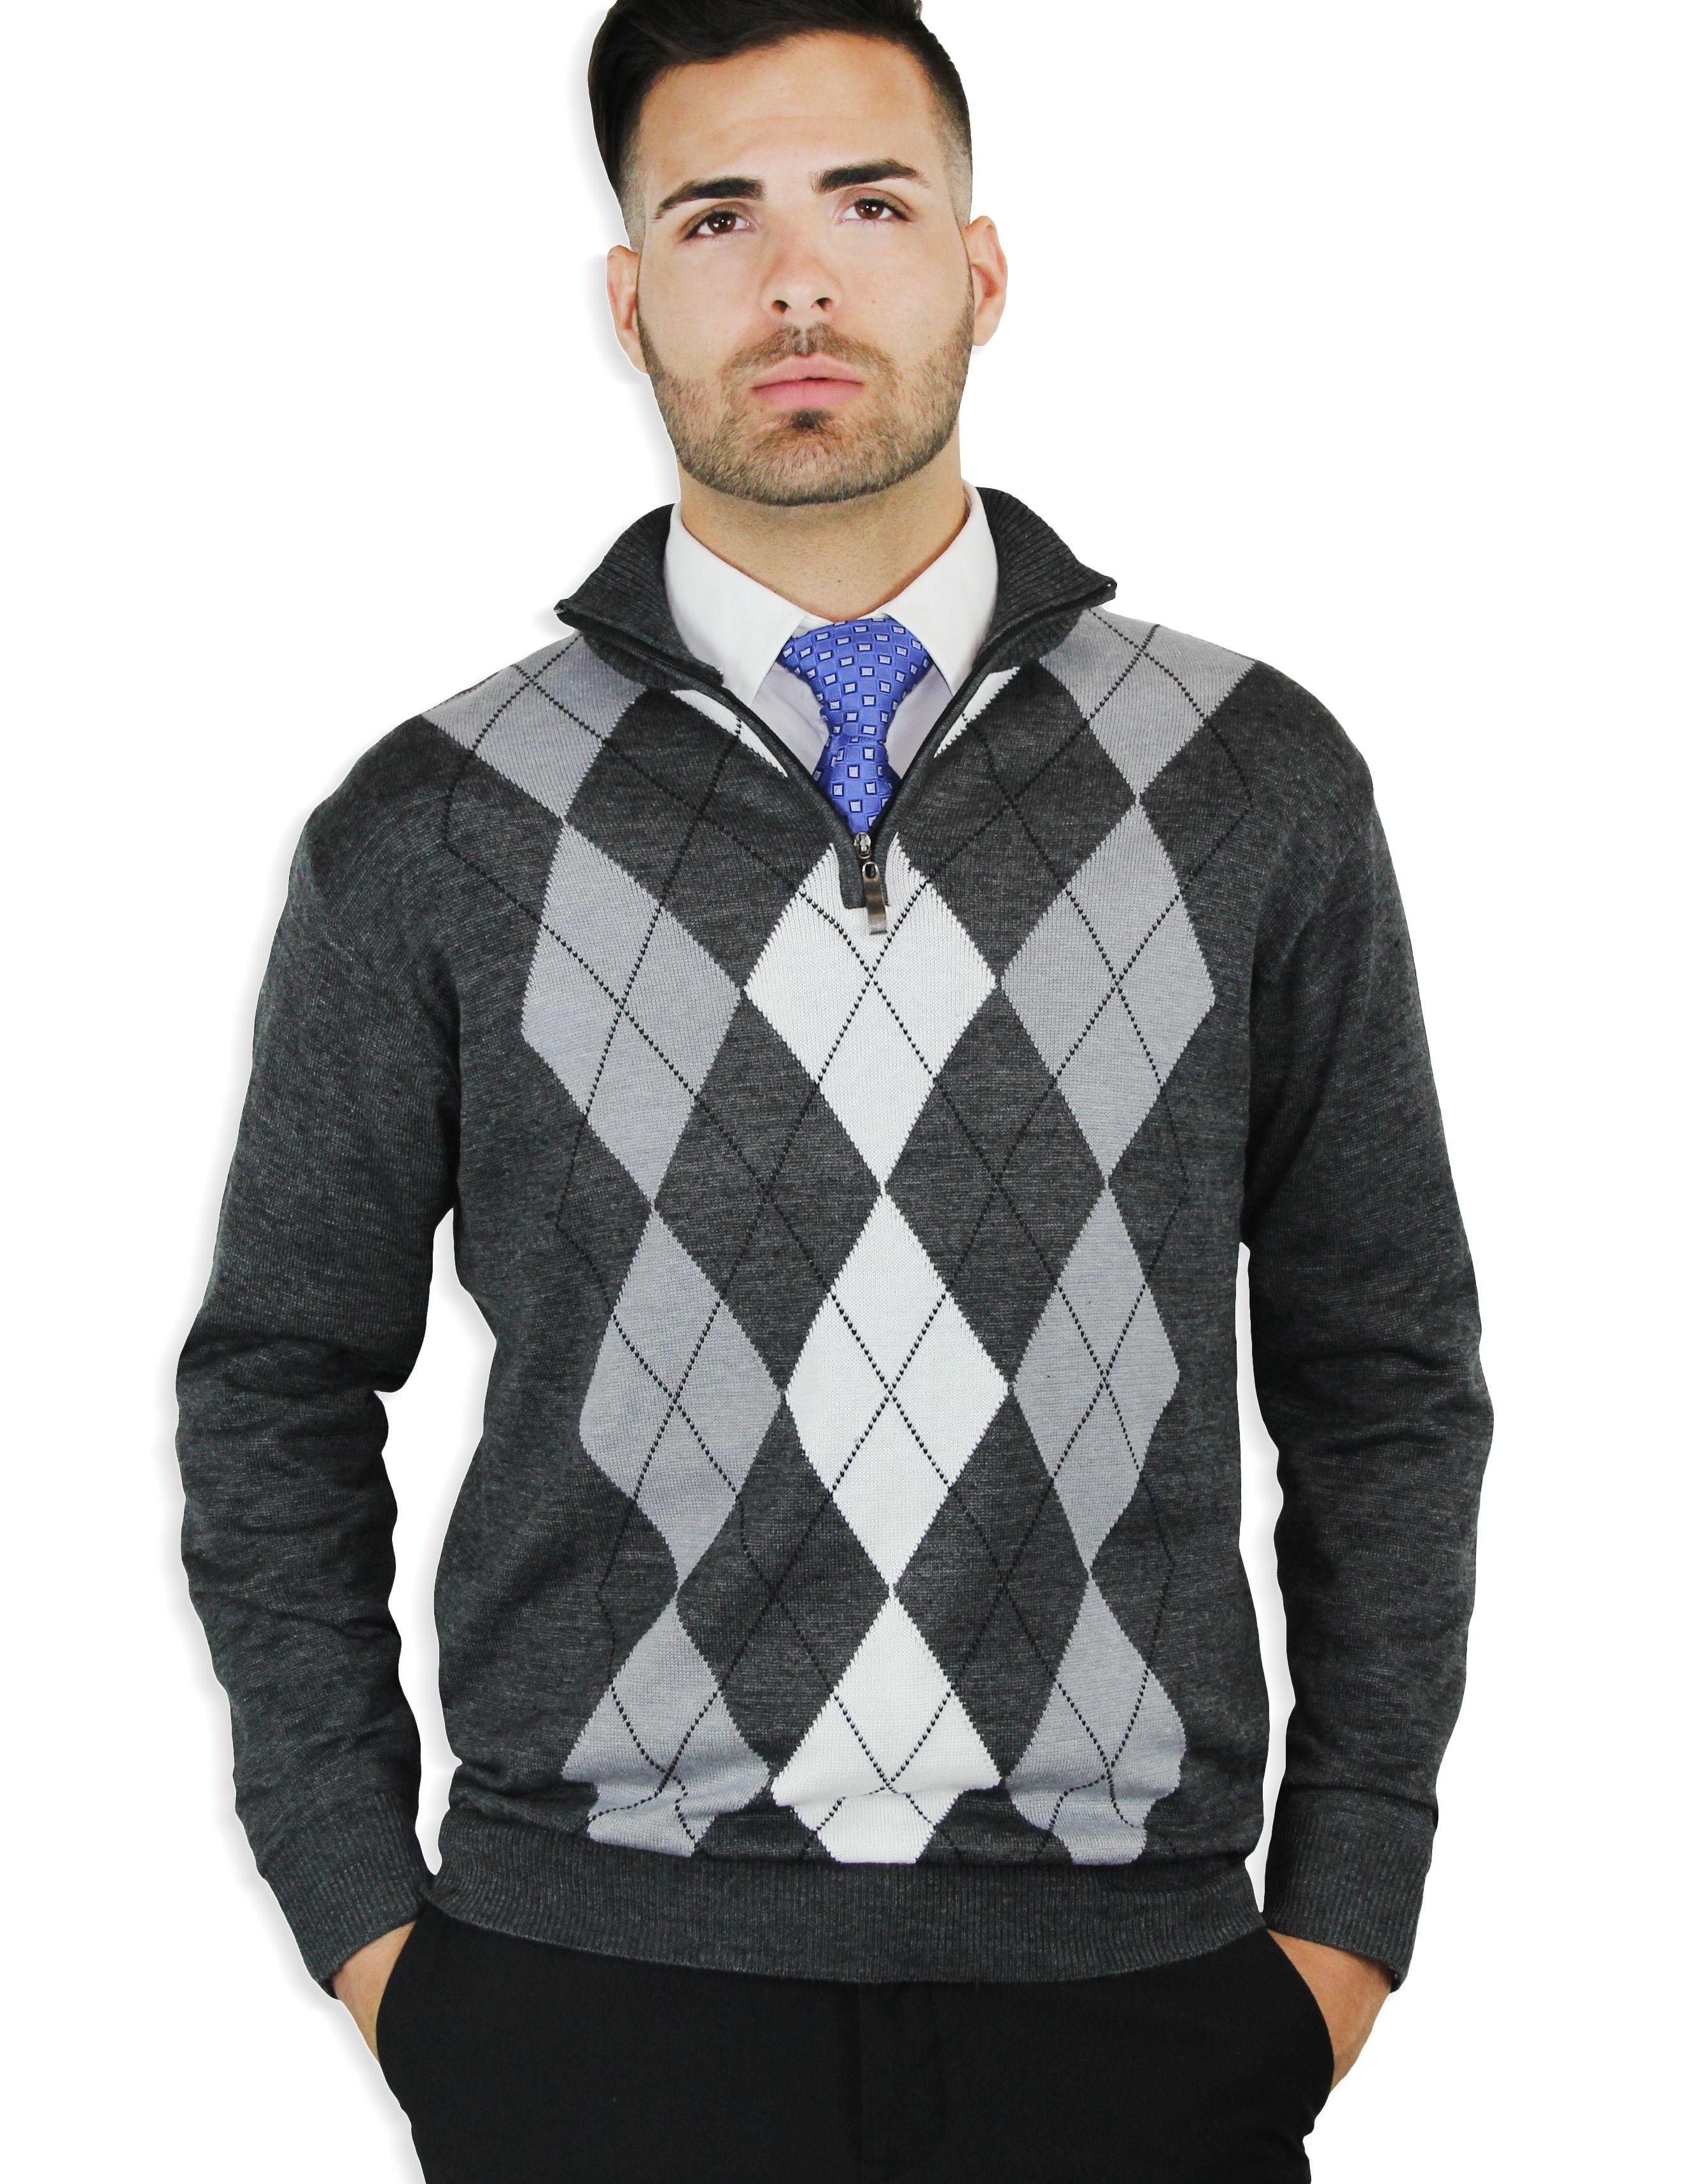 Quarter zip argyle sweater | Home & Casual | Pinterest